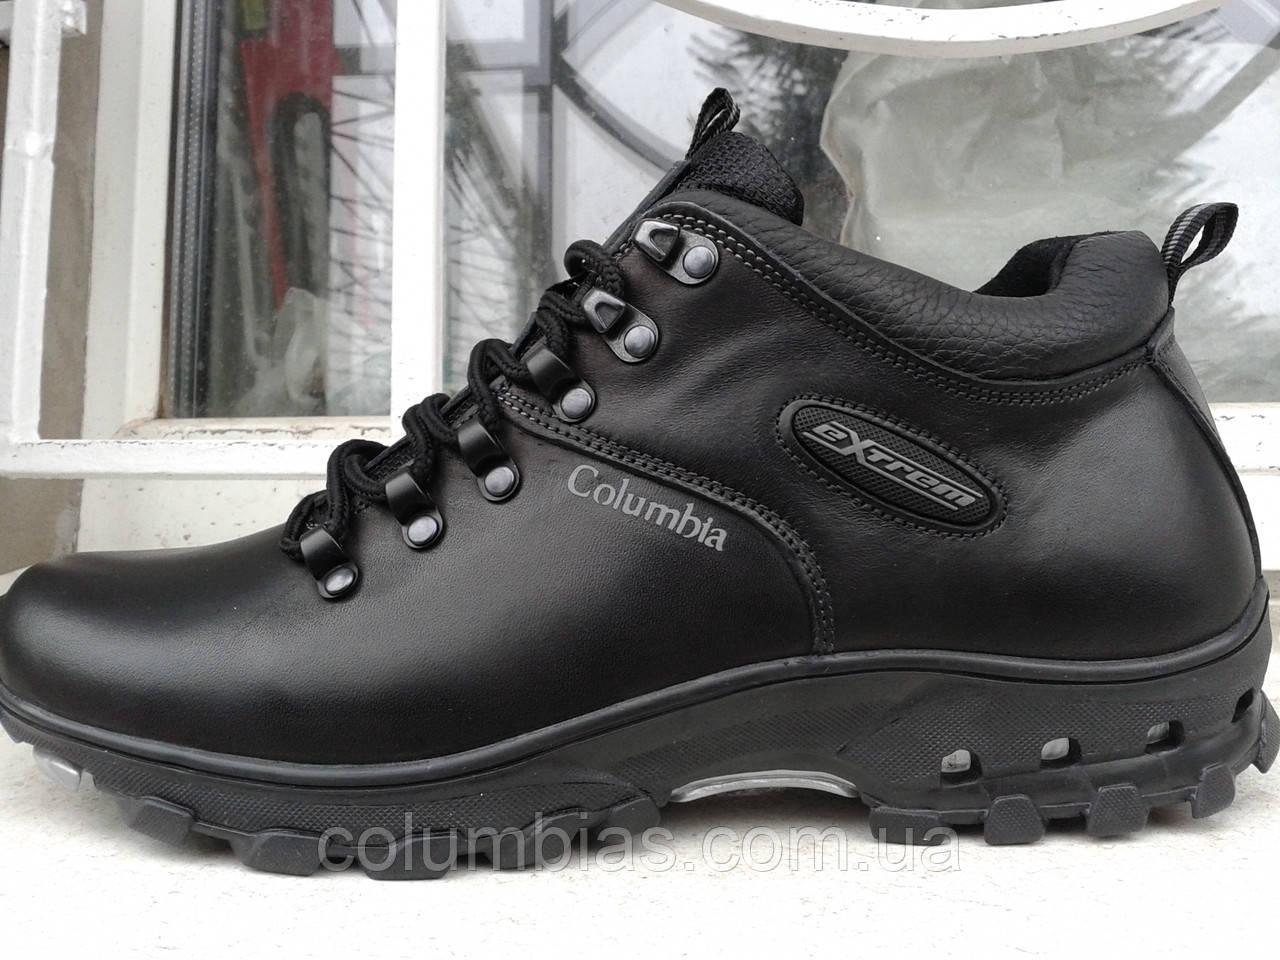 Мужские кожаные ботинки Columвia RT 3